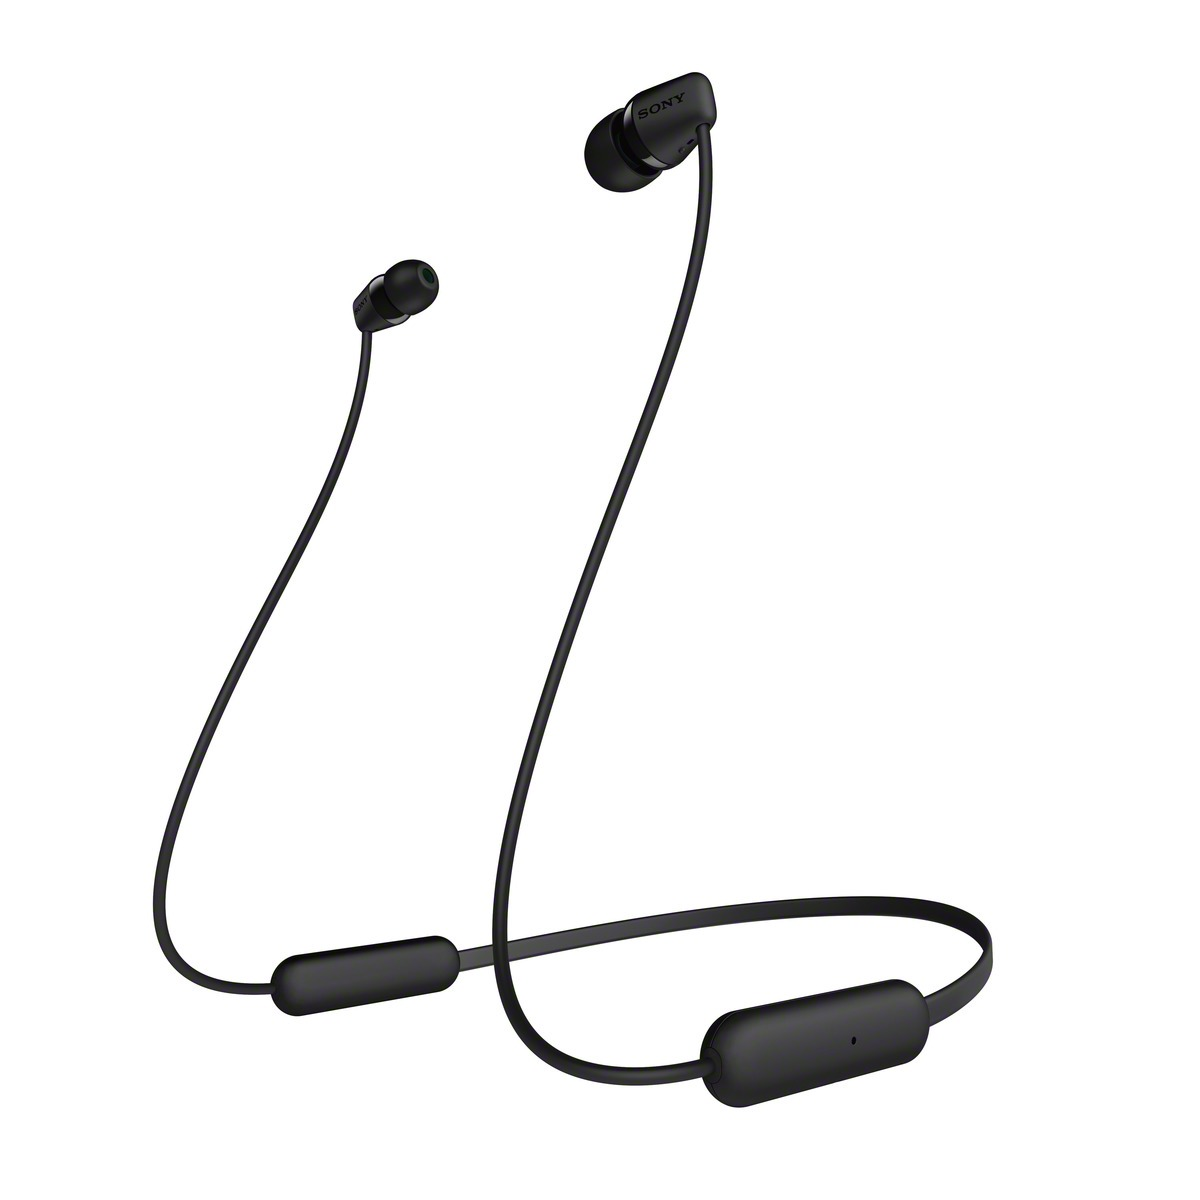 Korting Sony WI C200 In ear oordopjes